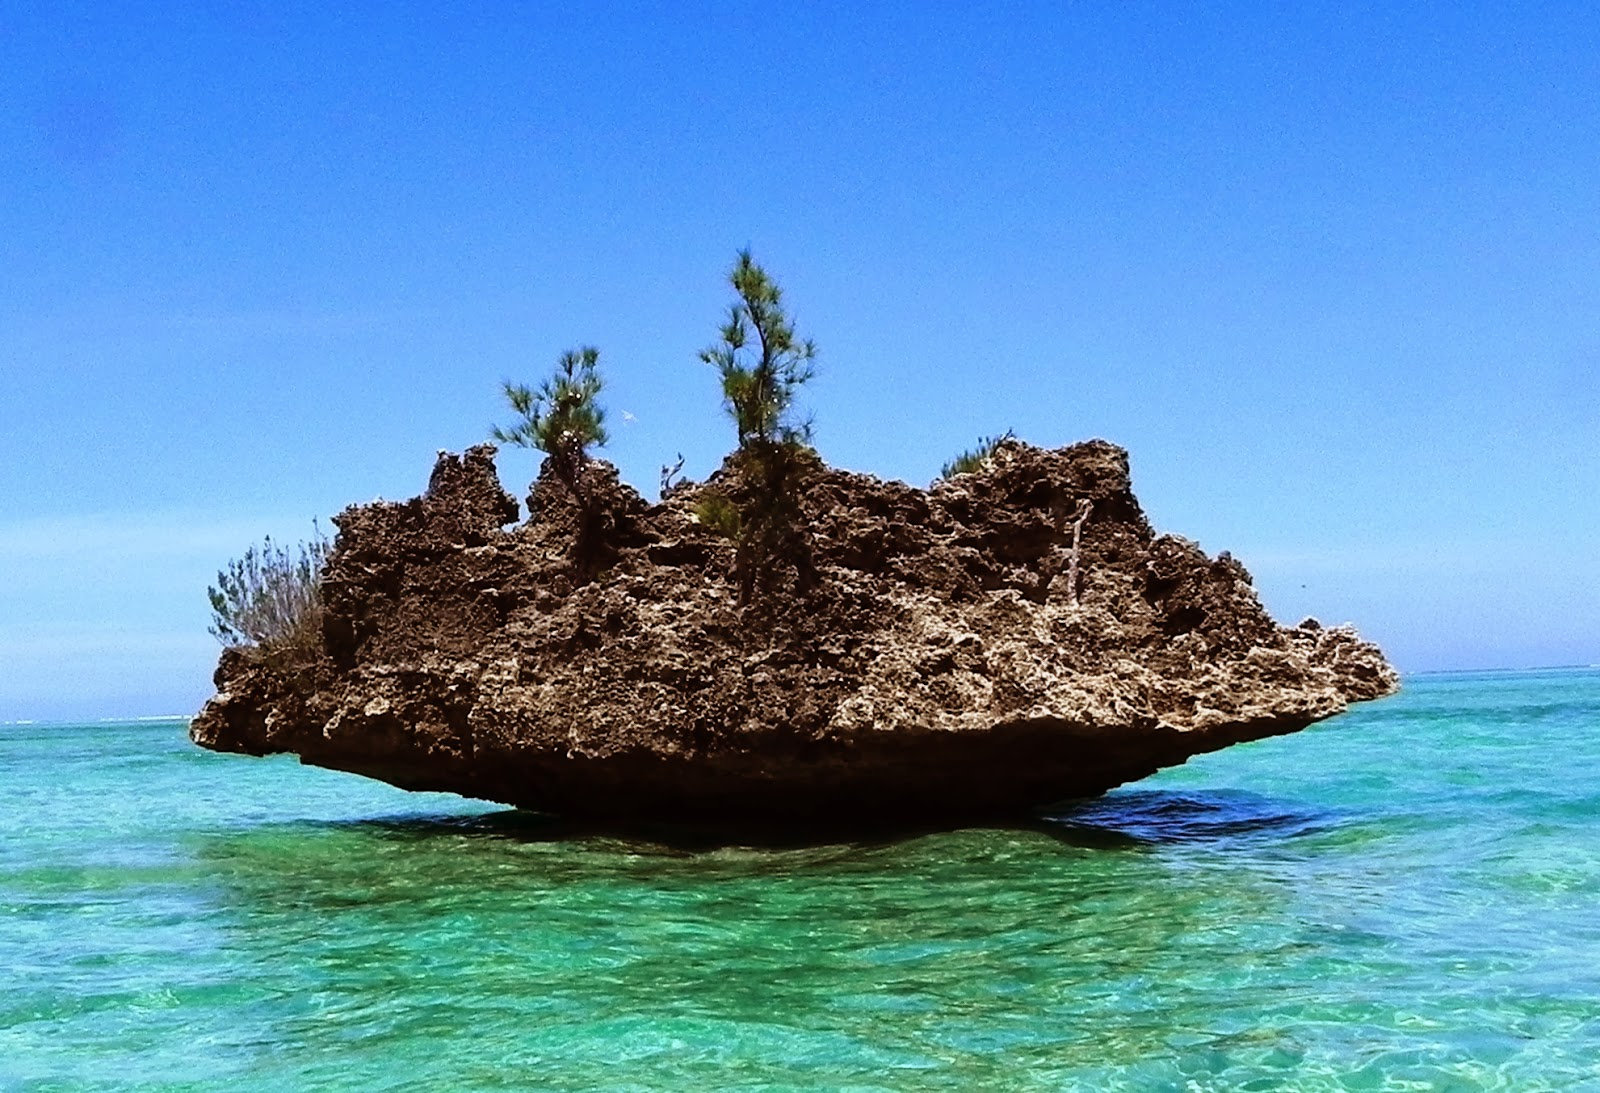 Koralleninsel